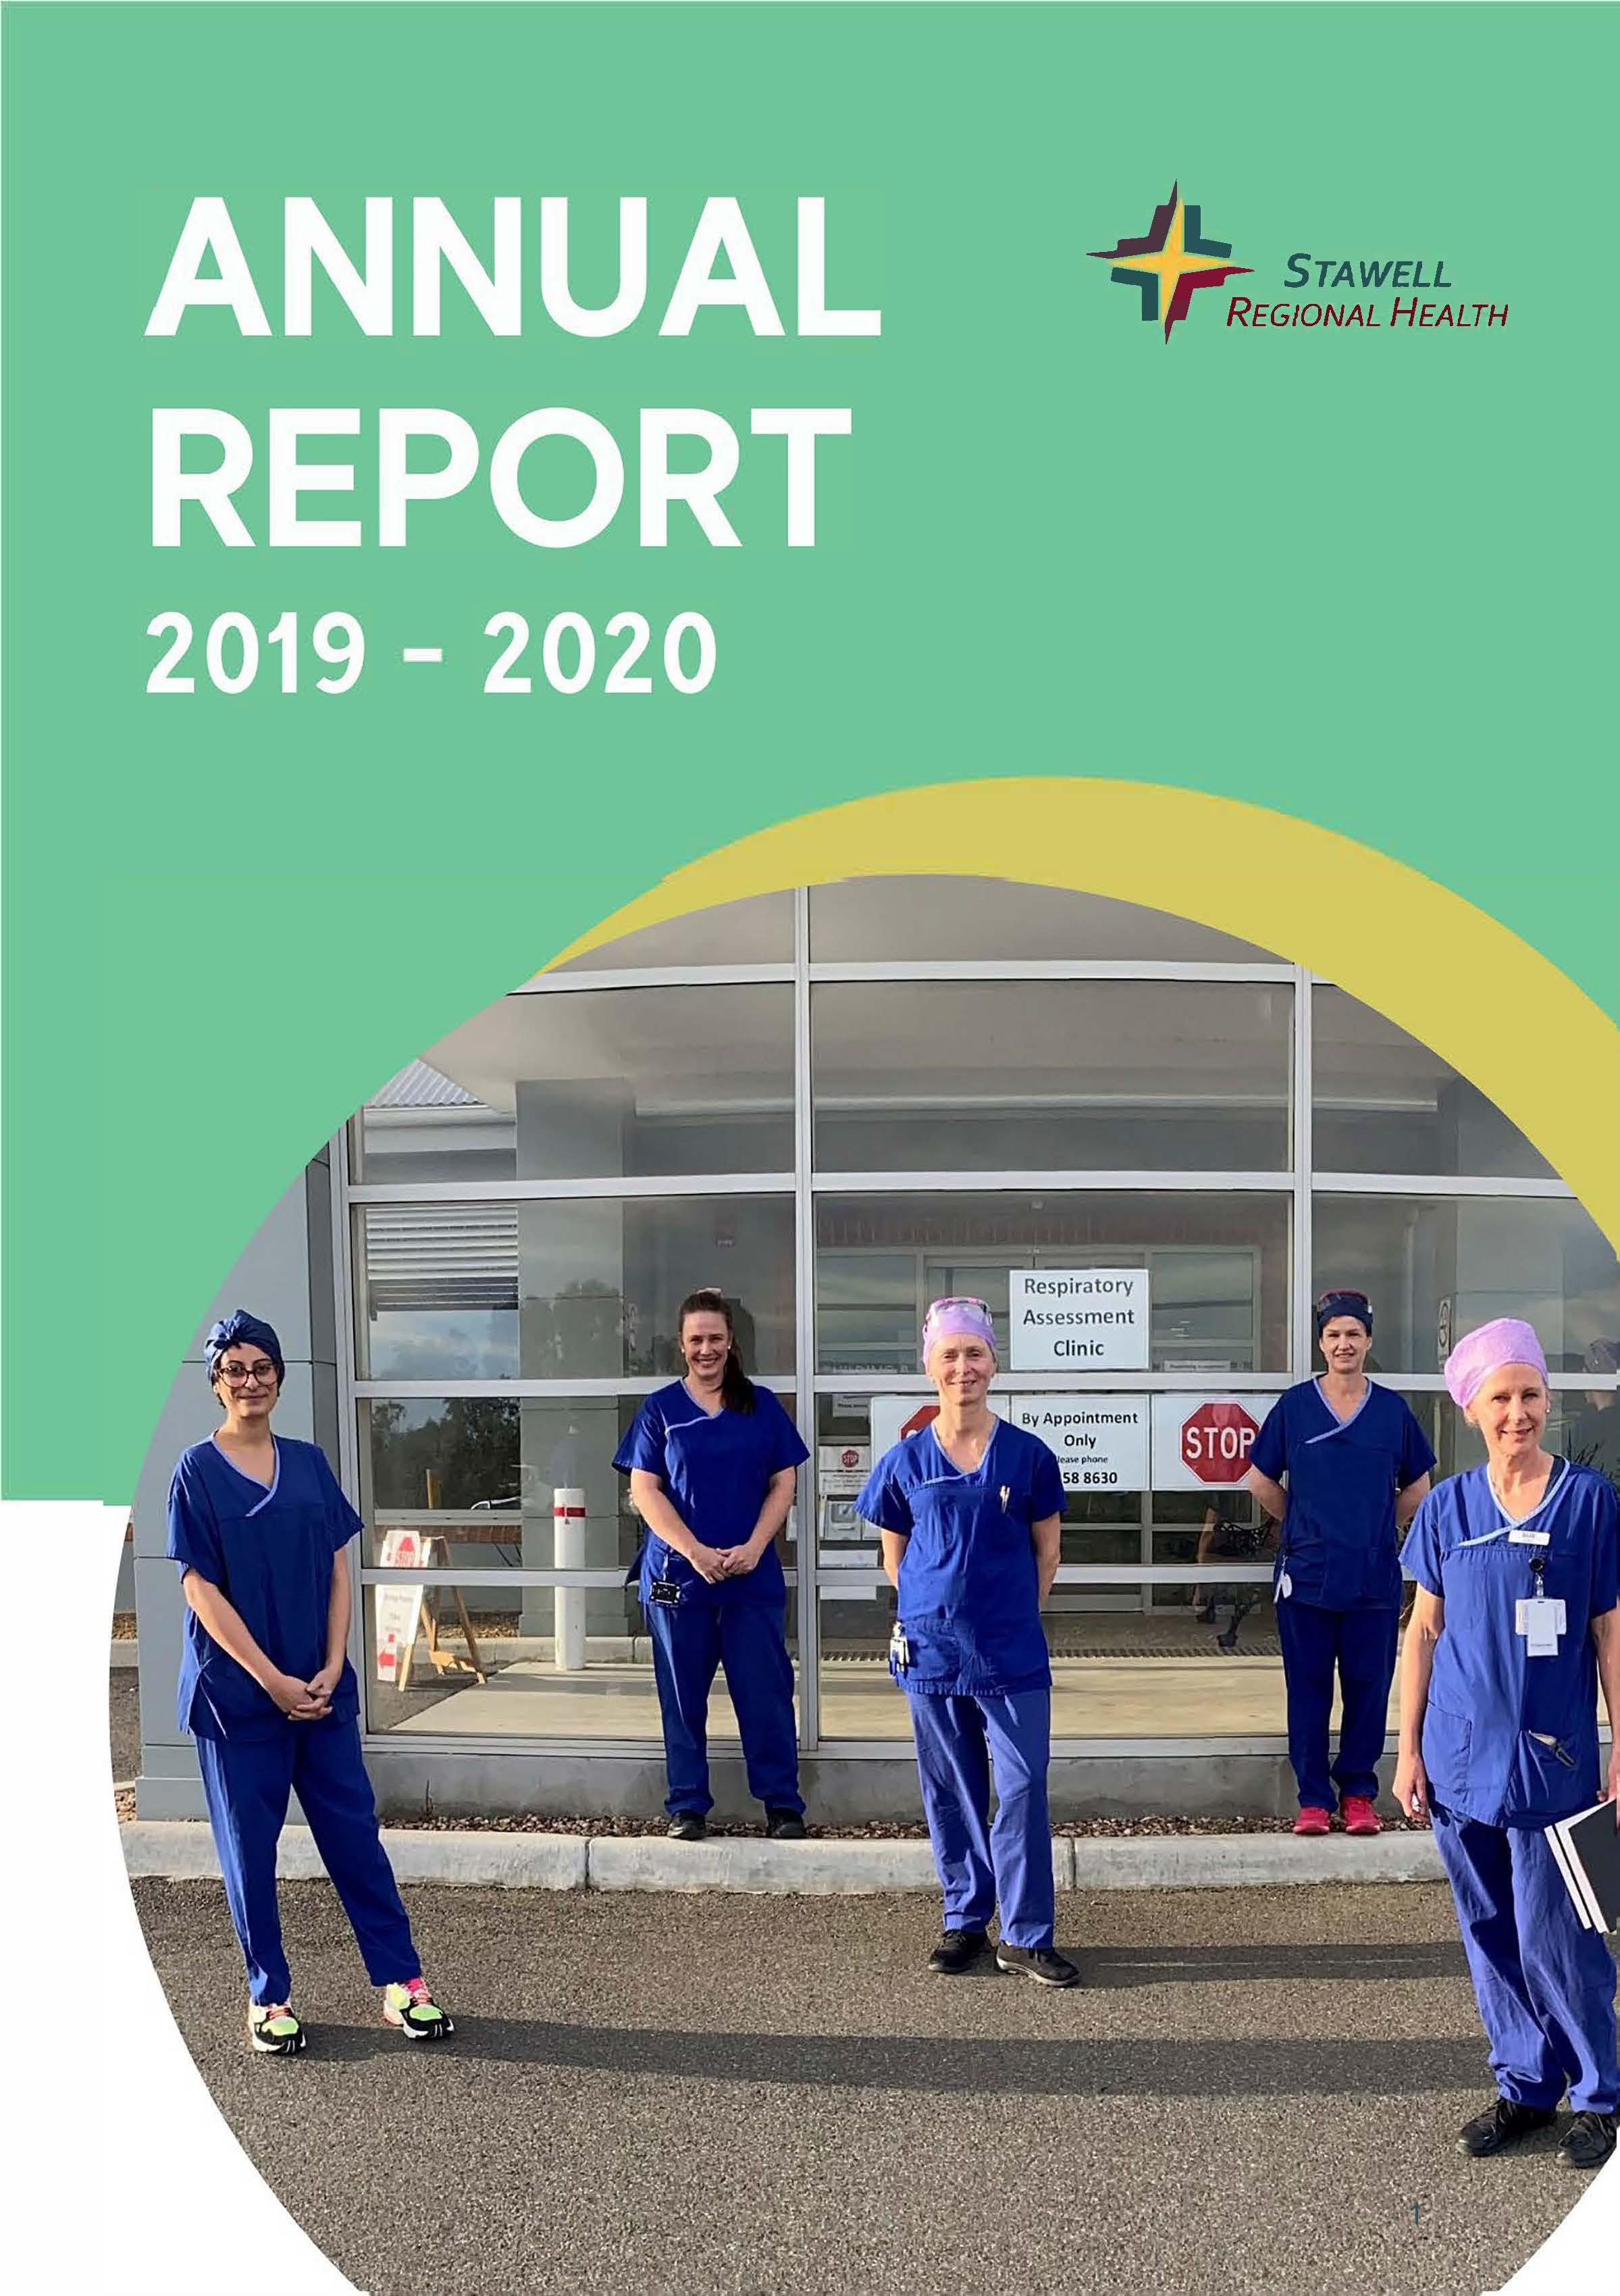 Stawell Regional Health Annual Report 2019-2020